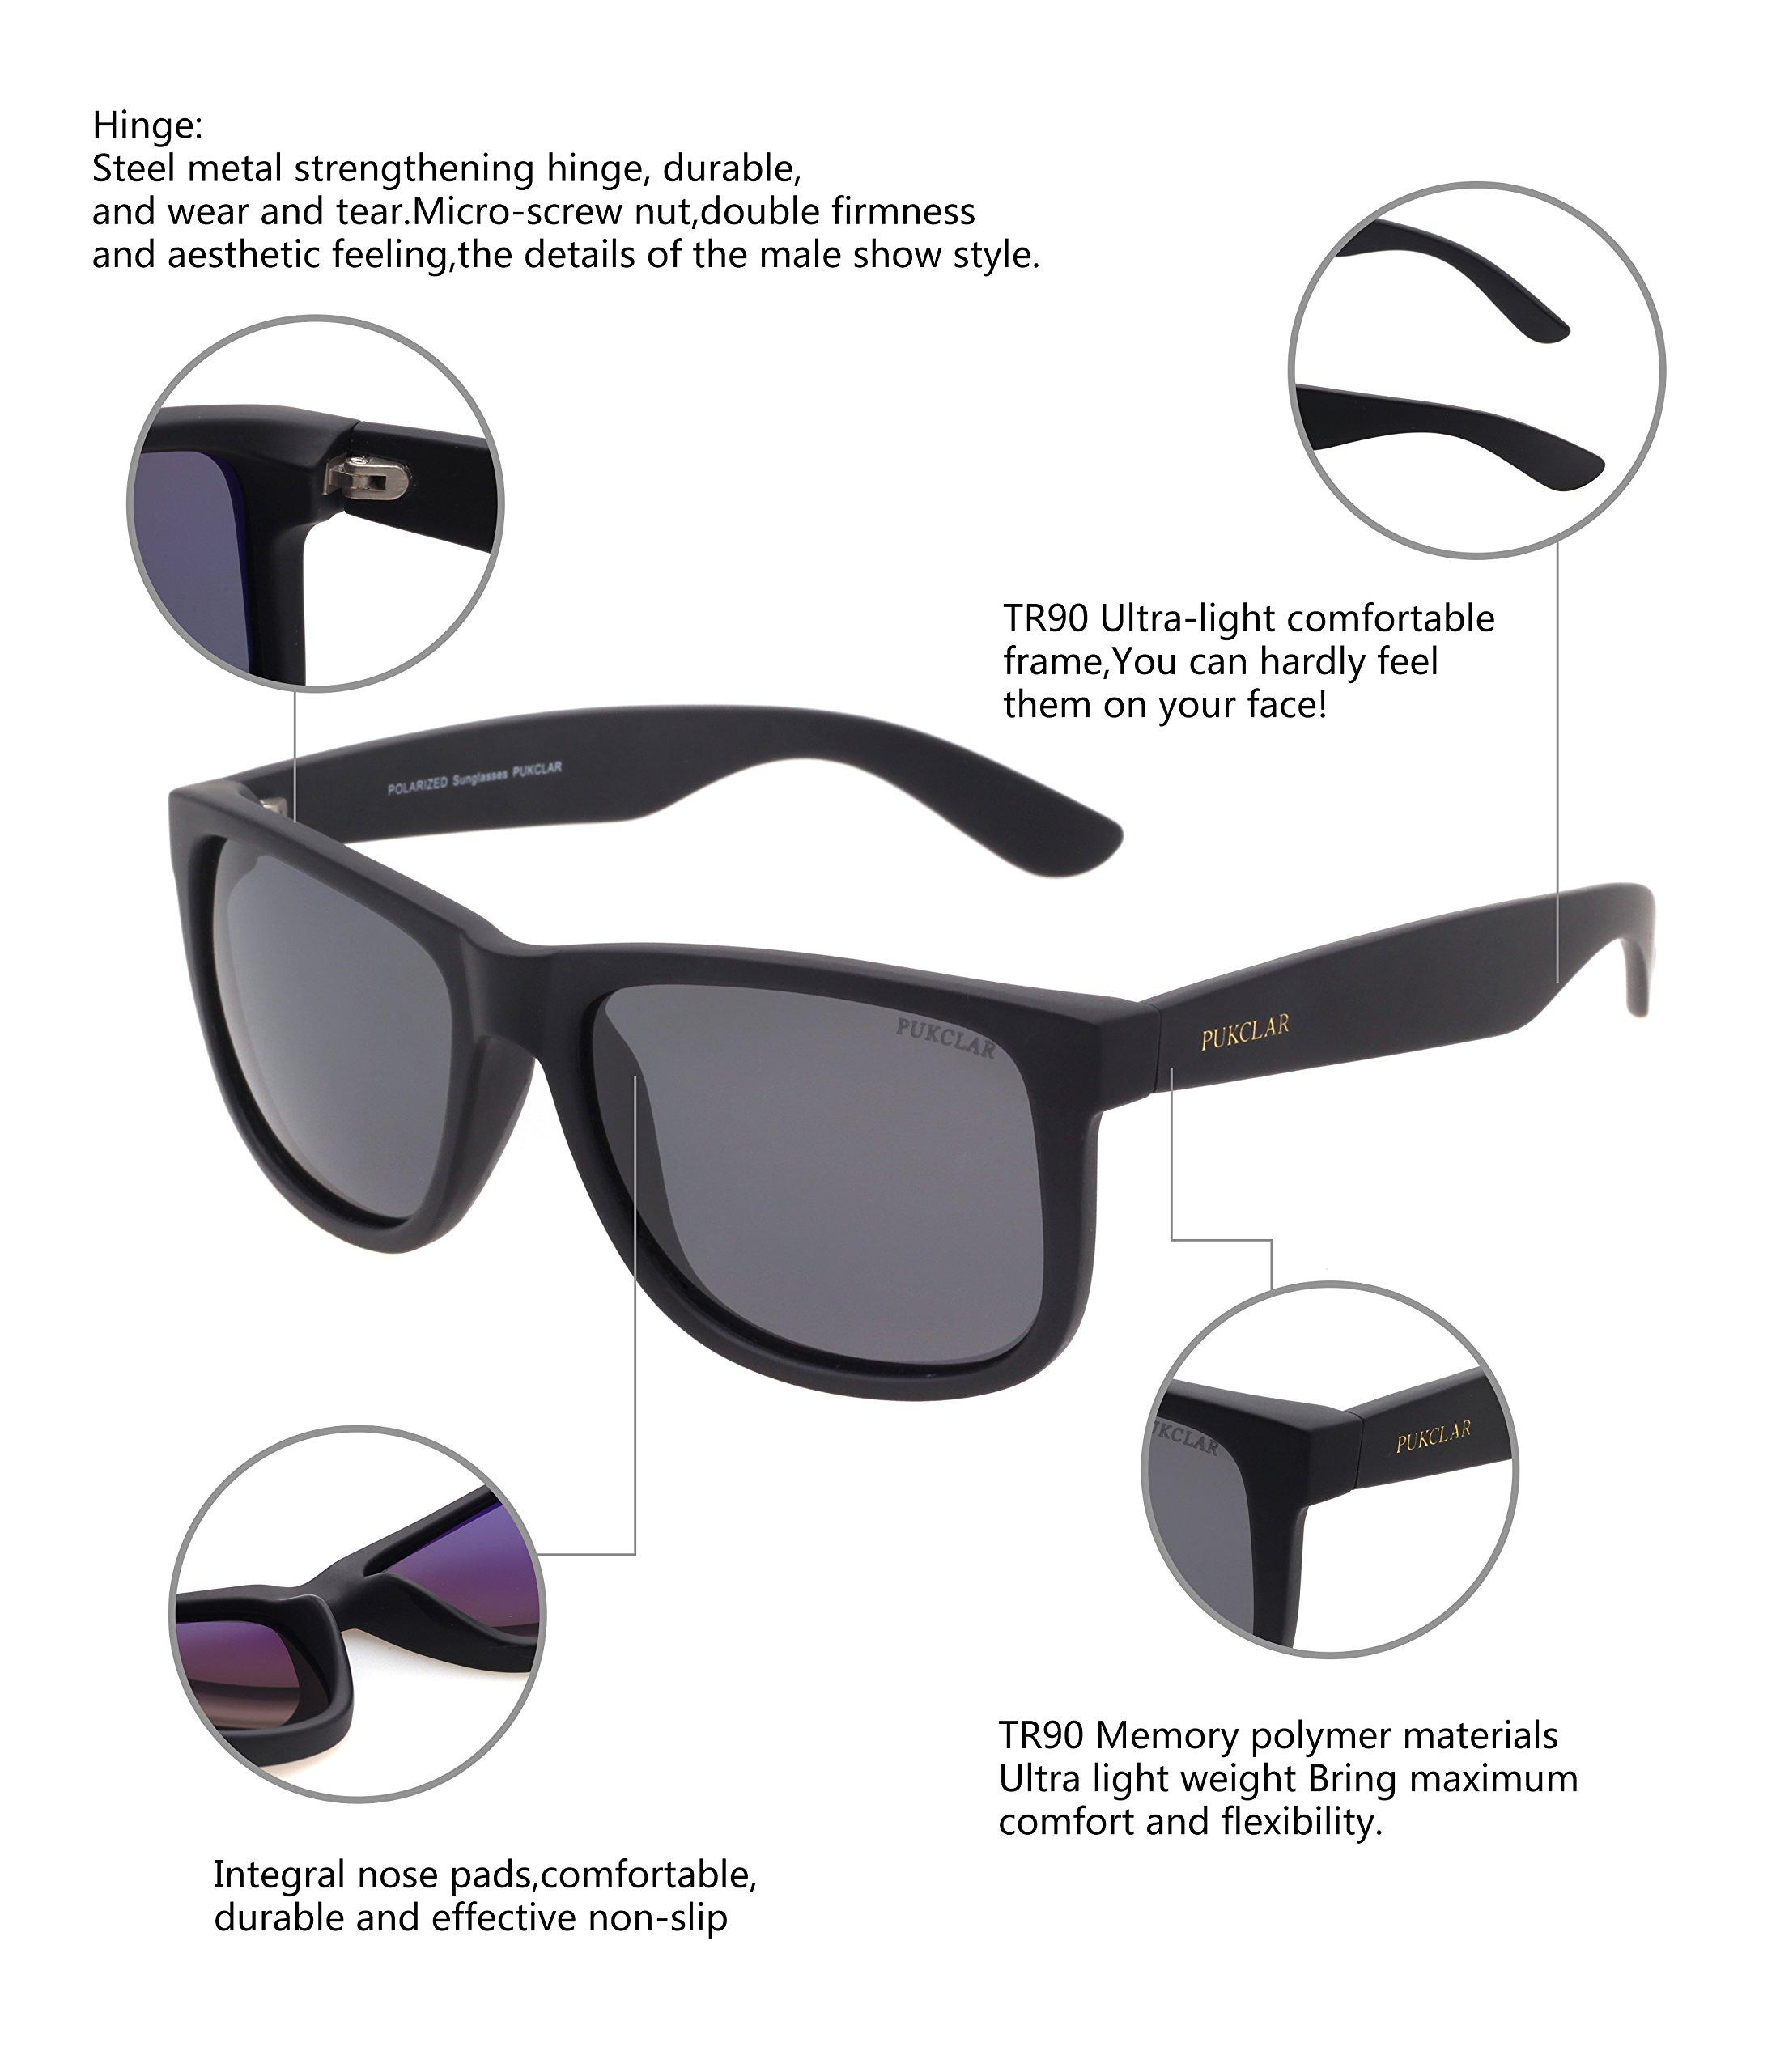 PUKCLAR Retro Polarized Wayfarer Sunglasses Classic UV400 Protection Sunglasses for Men Women Ultra Light pk1004